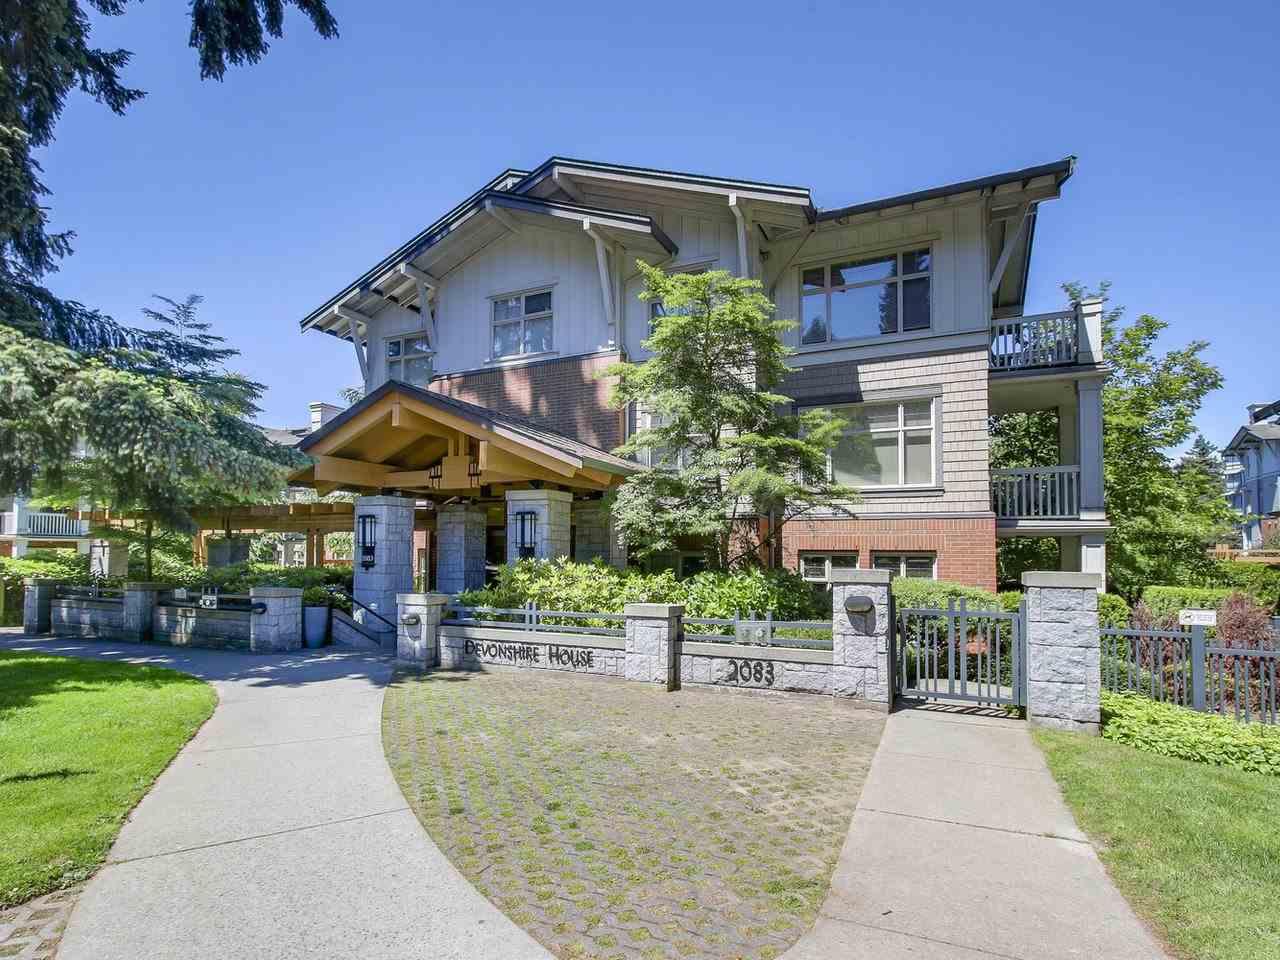 124 2083 W 33RD AVENUE, Vancouver